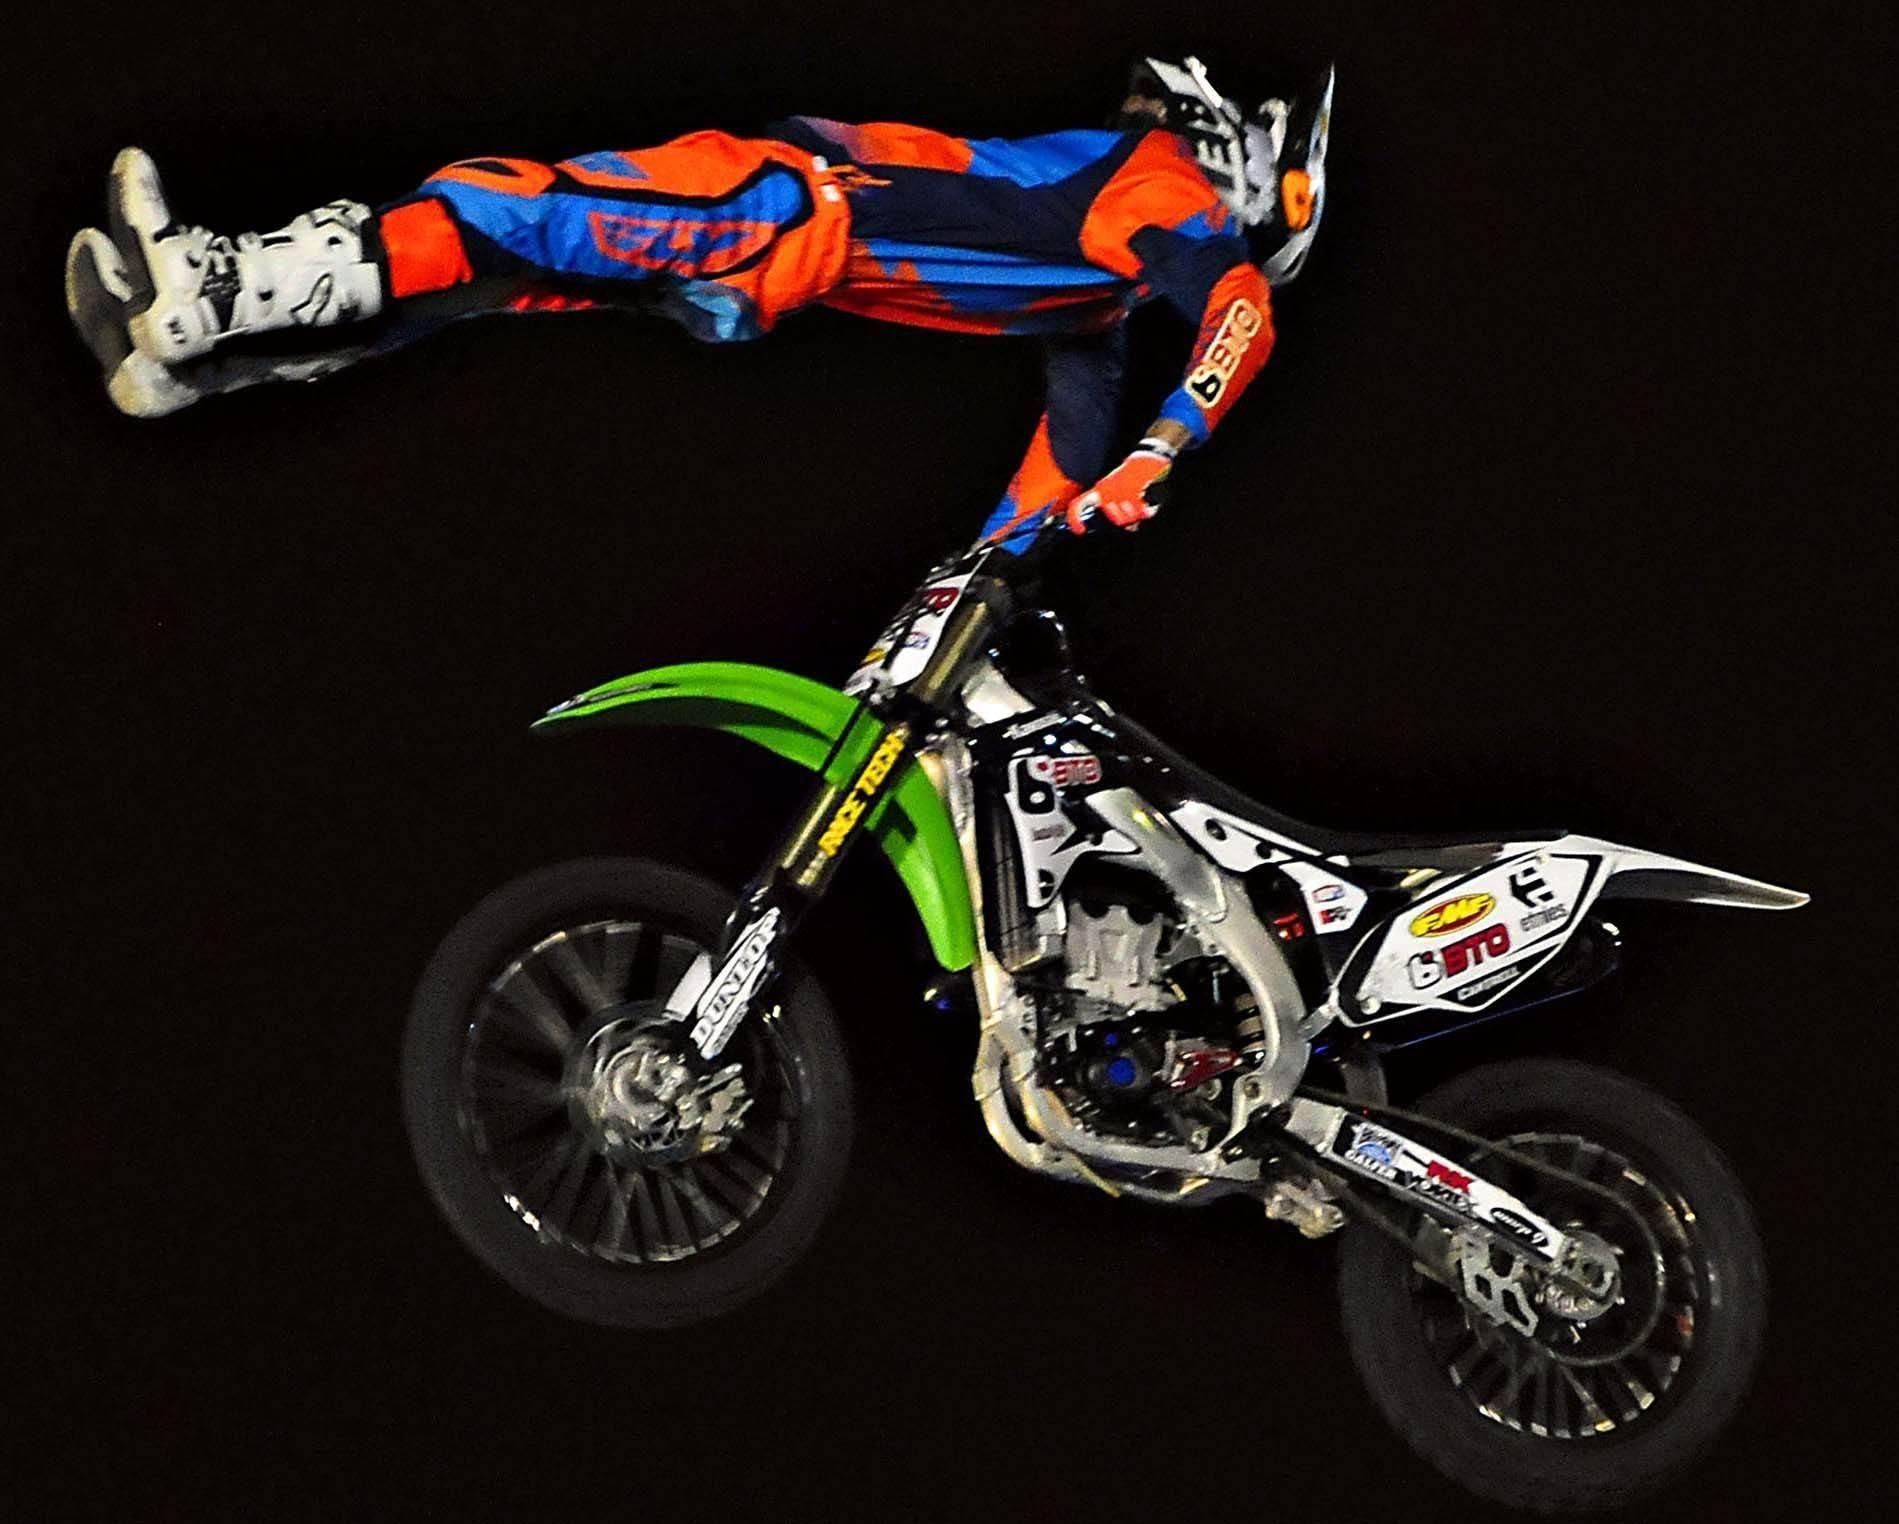 Freestyle Dirtbike Motocross Moto Bike Extreme Motorbike Dirt High